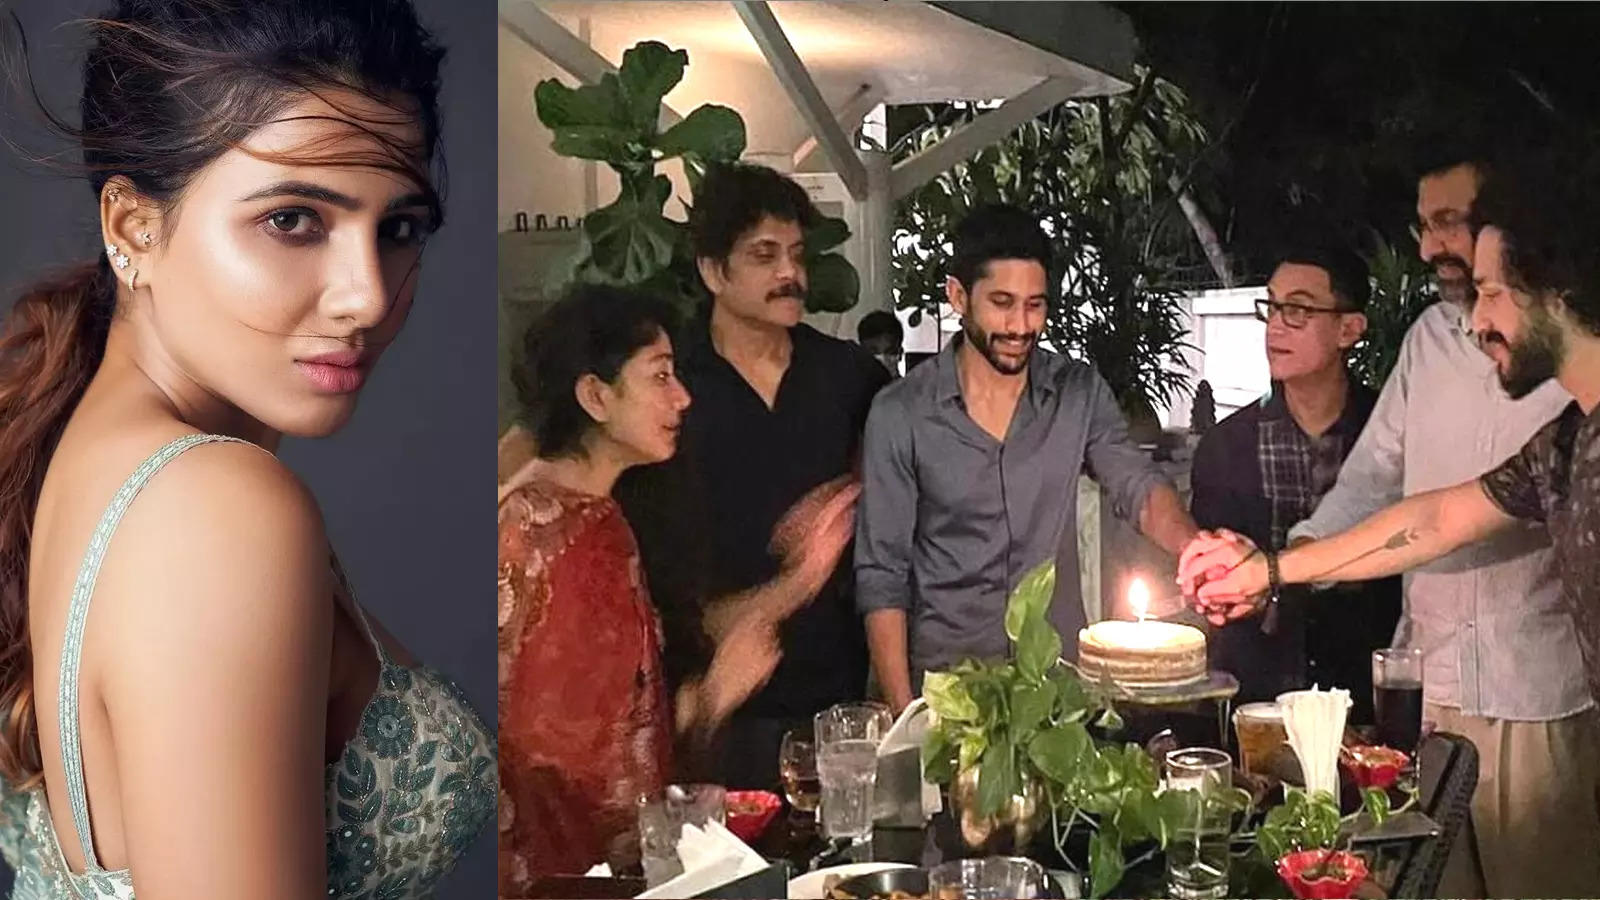 amid-divorce-rumours-samantha-prabhu-misses-father-in-law-nagarjuna-and-naga-chaitanyas-dinner-party-for-aamir-khan